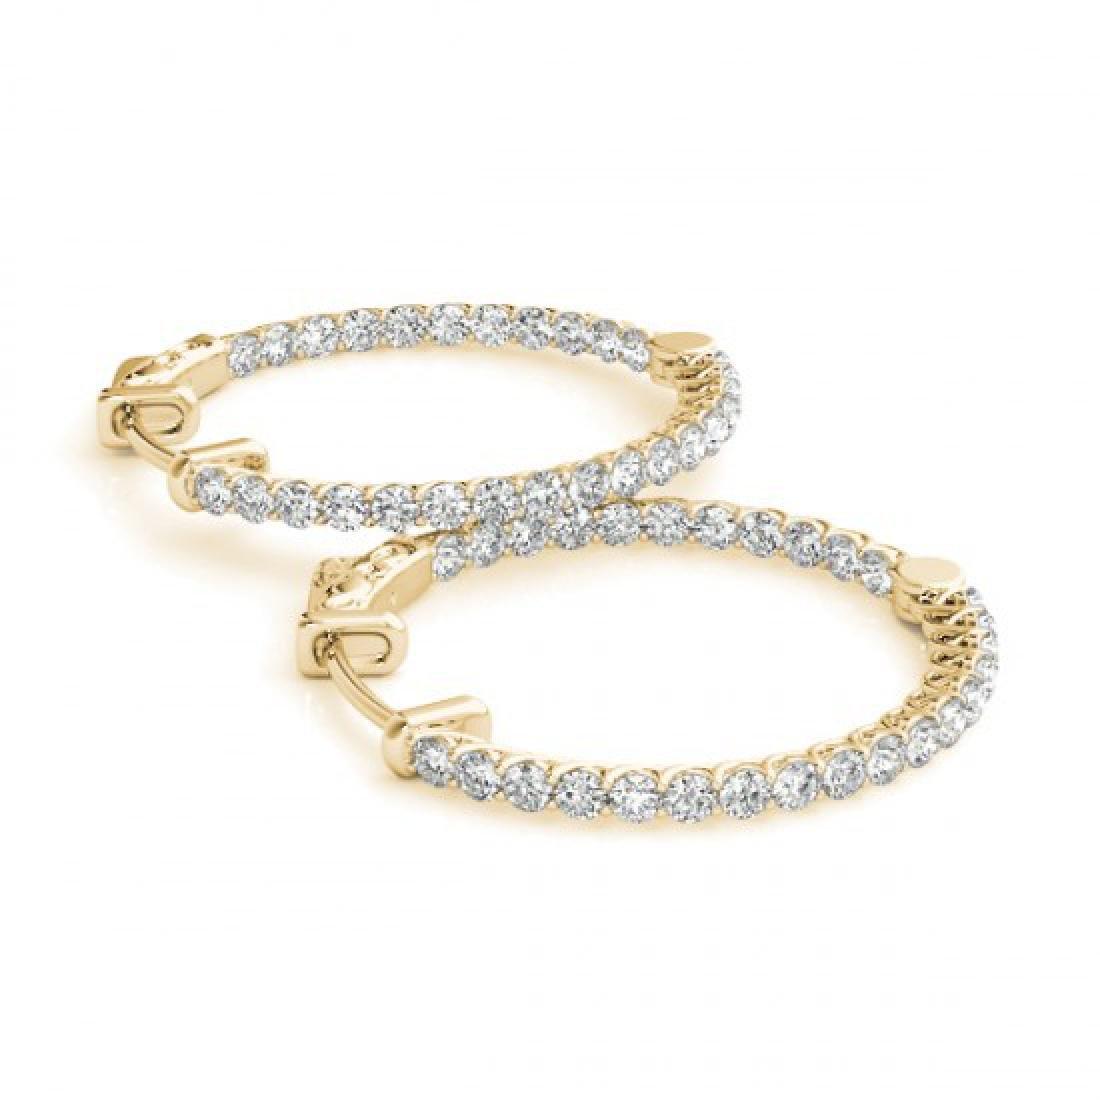 2 CTW Diamond VS/SI Certified 21 Mm Hoop Earrings 14K